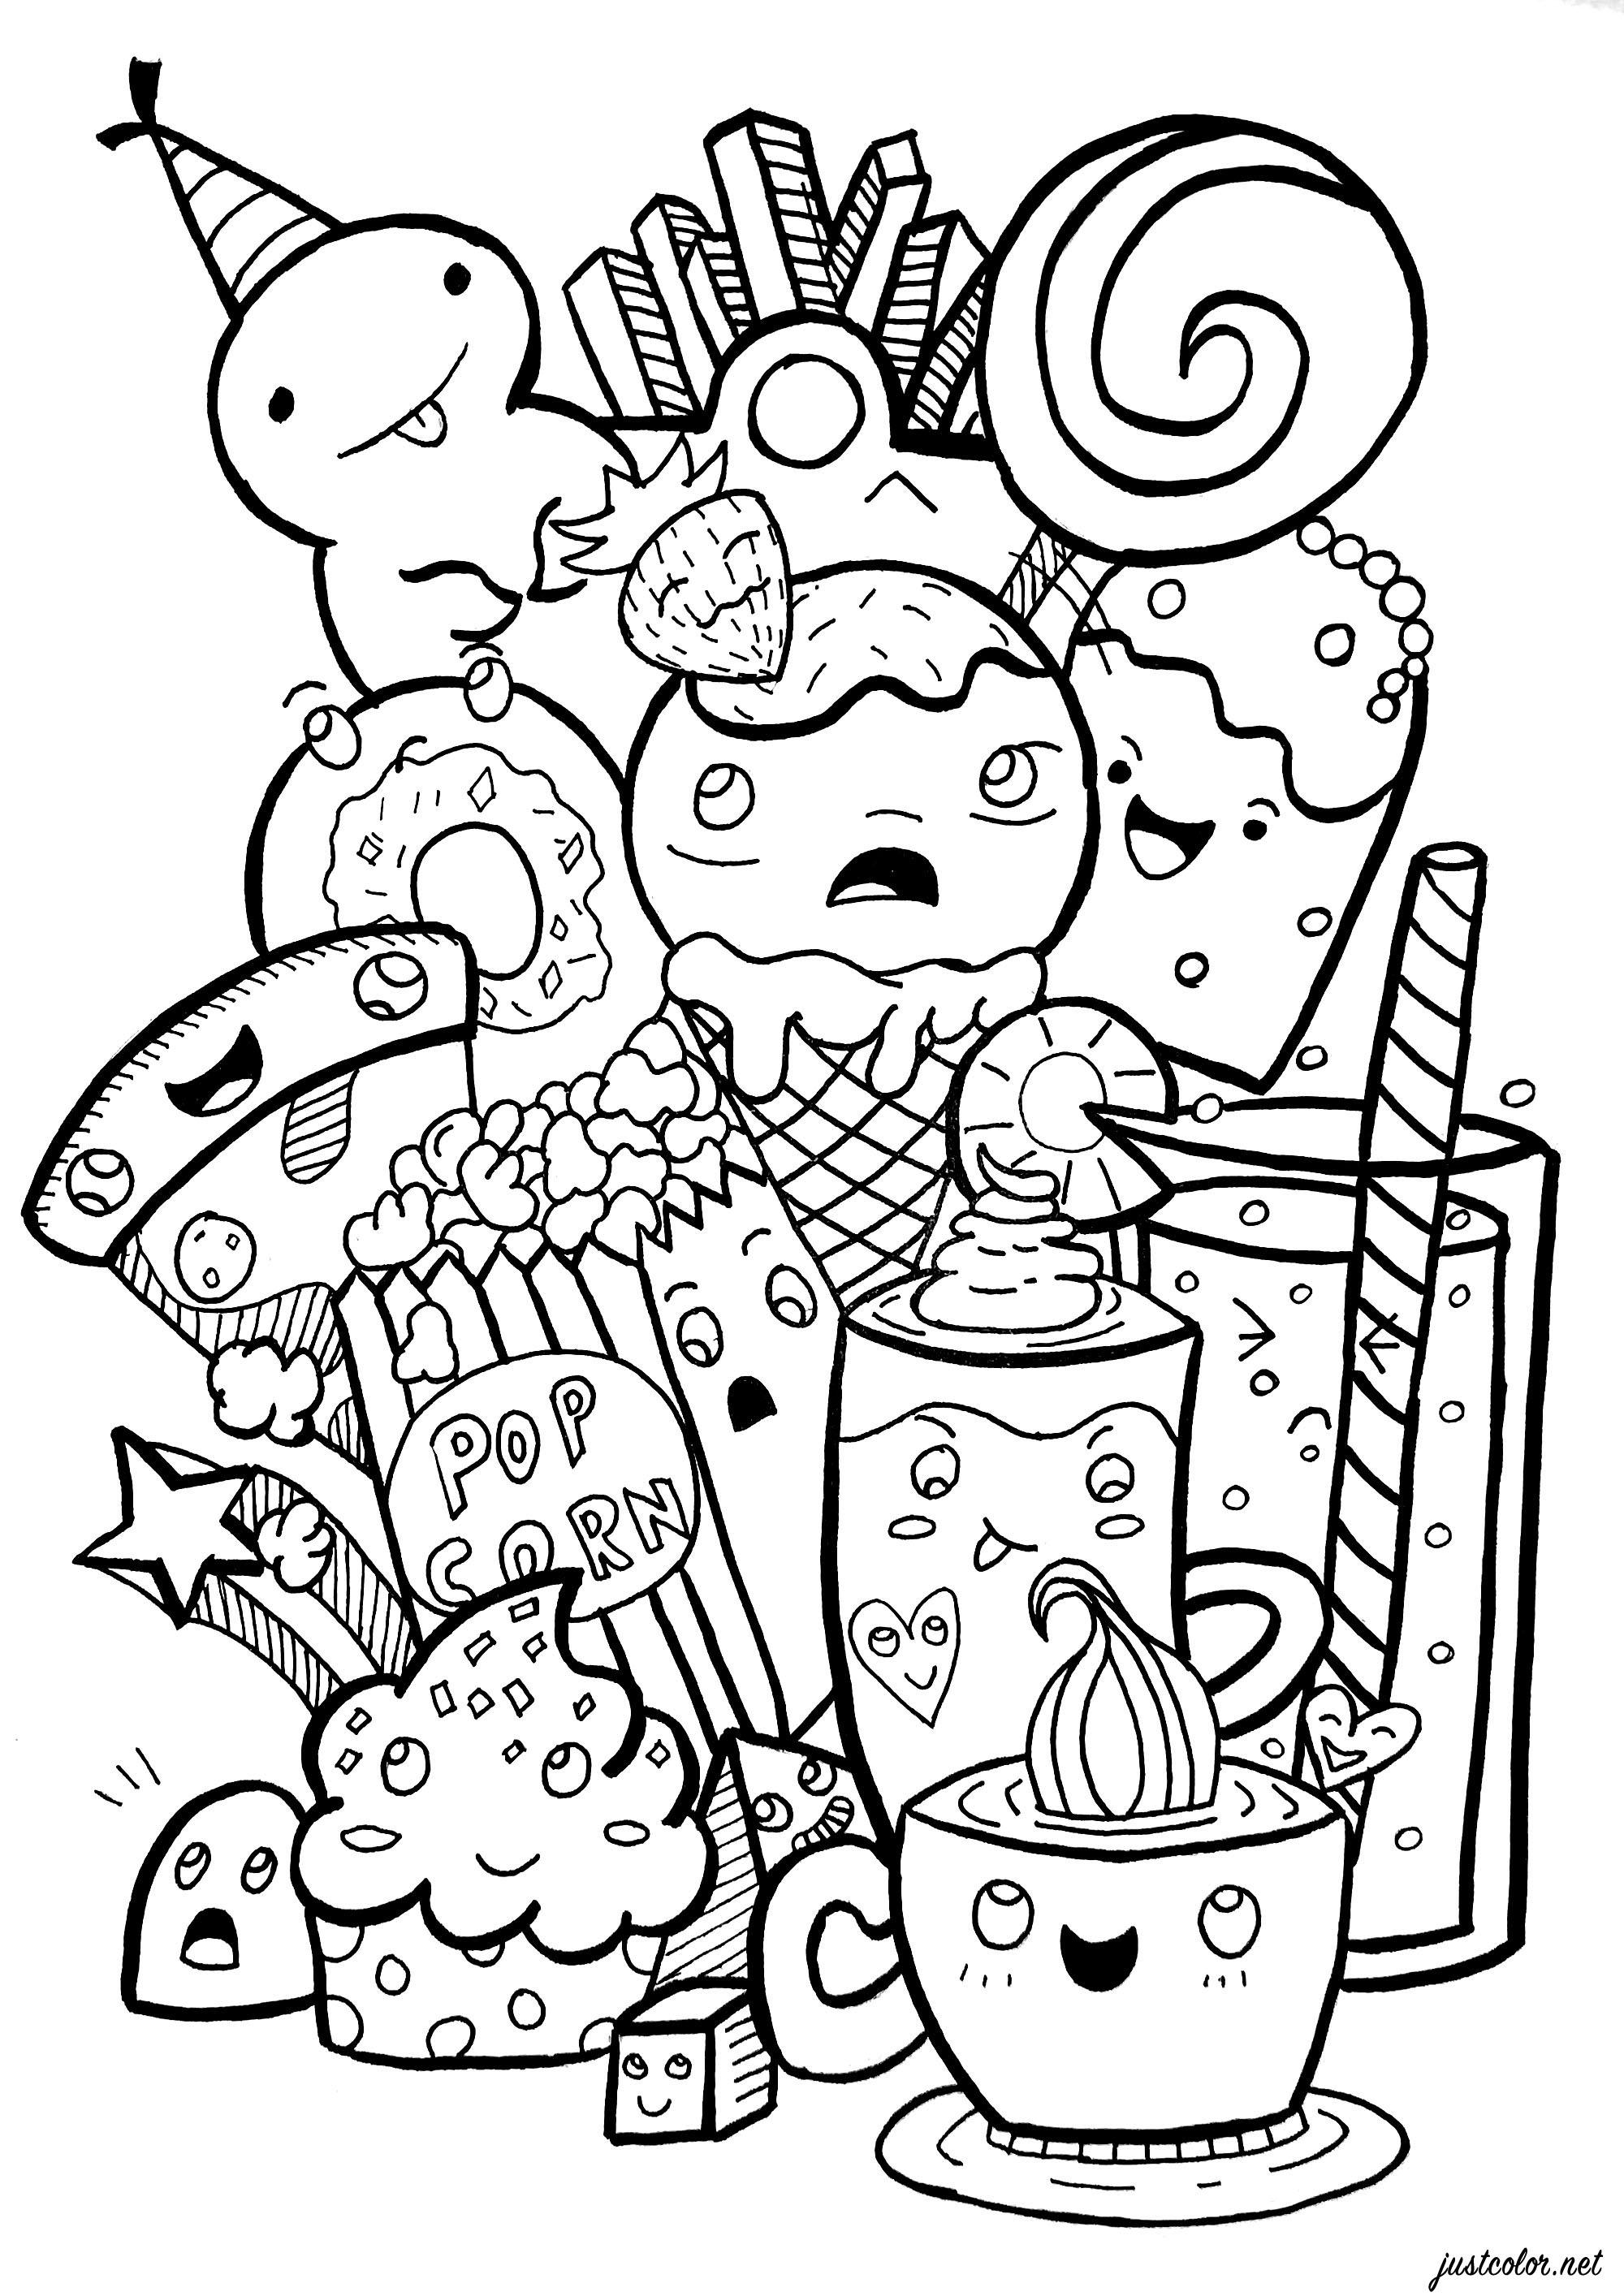 Doodle Junk Food